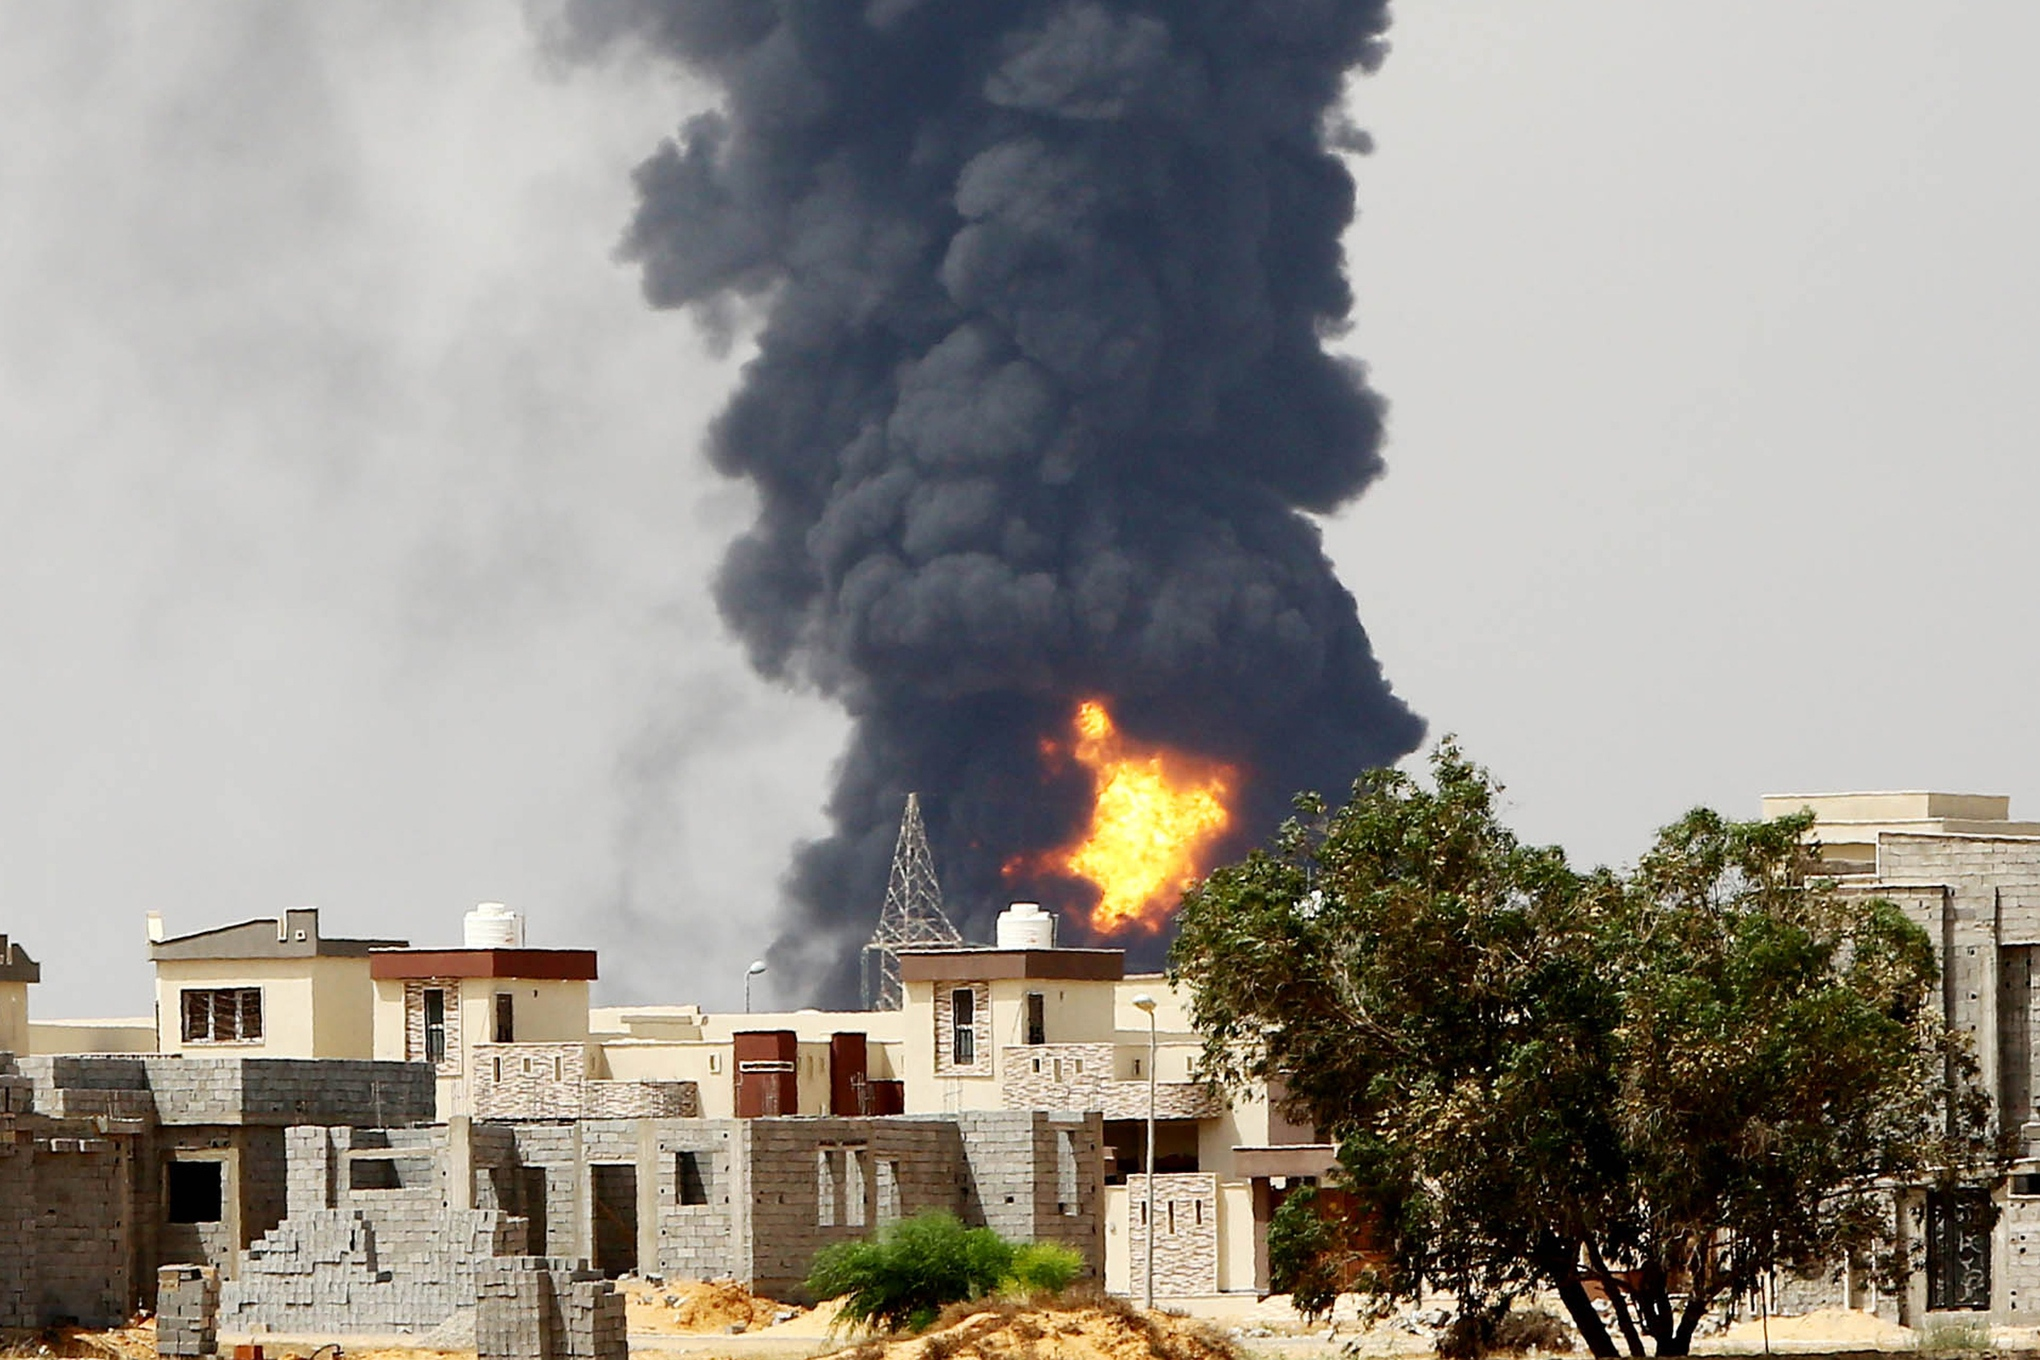 Libya_oil_fire_tripoli_mahmud_turkia_afp_getty_images